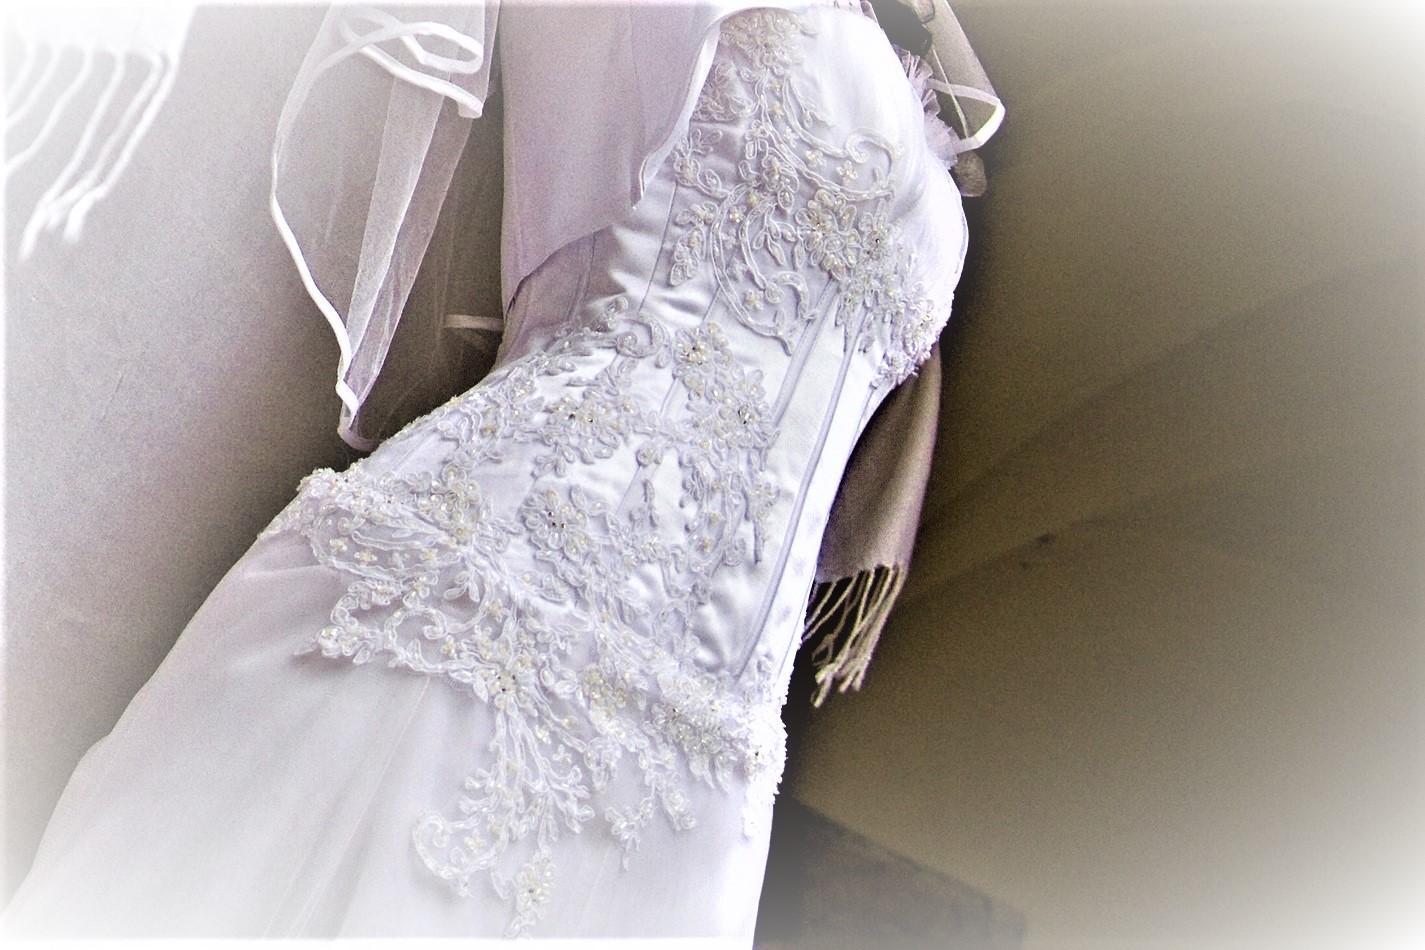 Svadobné šaty Maggie Sottero - Obrázok č. 3